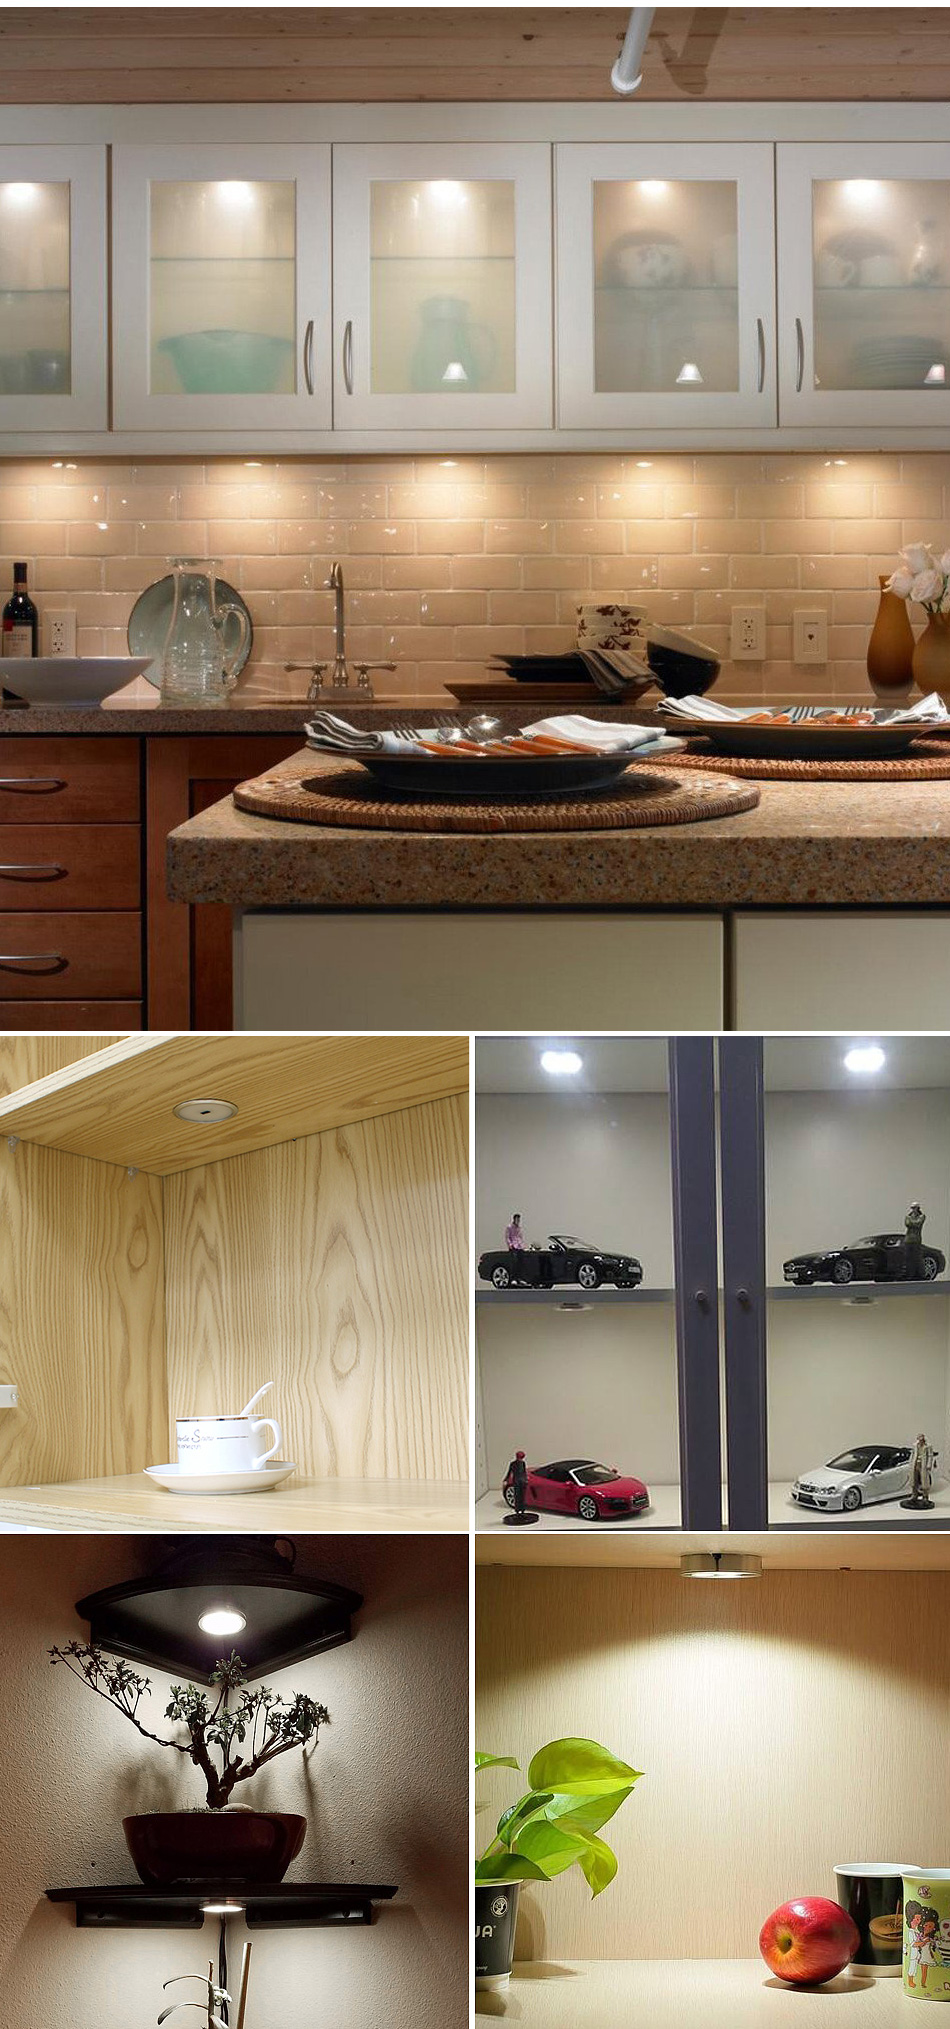 Under Cabinet Lights Puck Light 12V Round Aluminum Shelf Kitchen Closet Lamps LED Closet Lighting Night Showcase Counter Lamp (13)